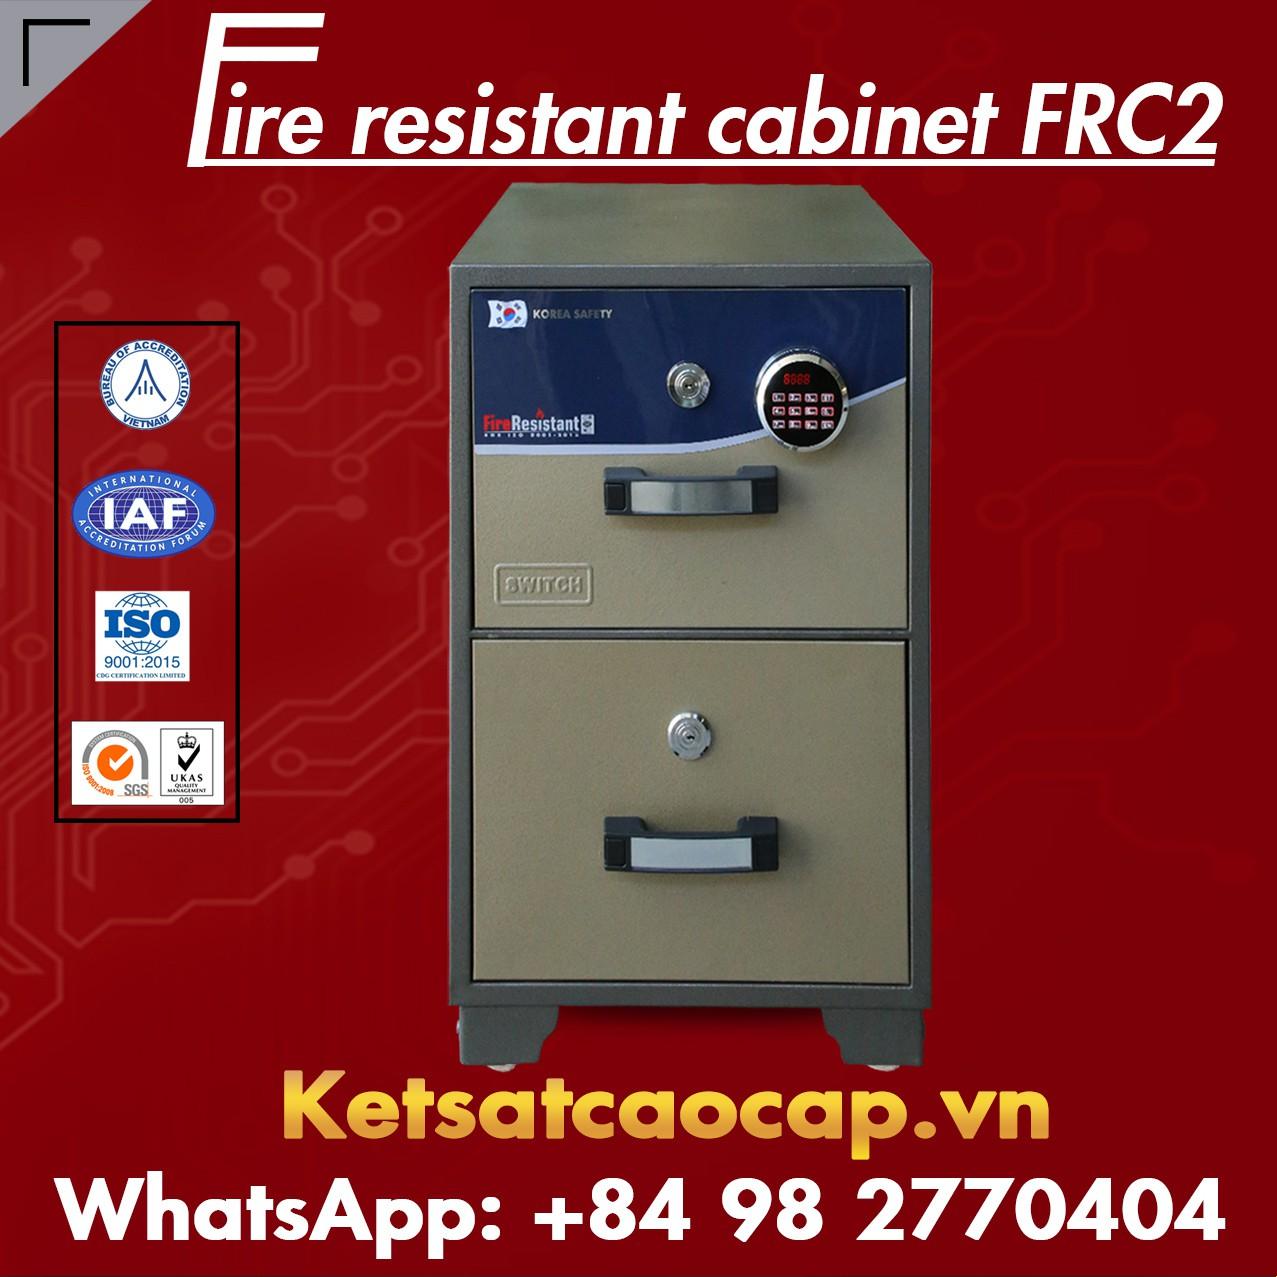 Fireproof Filing Cabinet WELKO FRC2 LED Brown 111